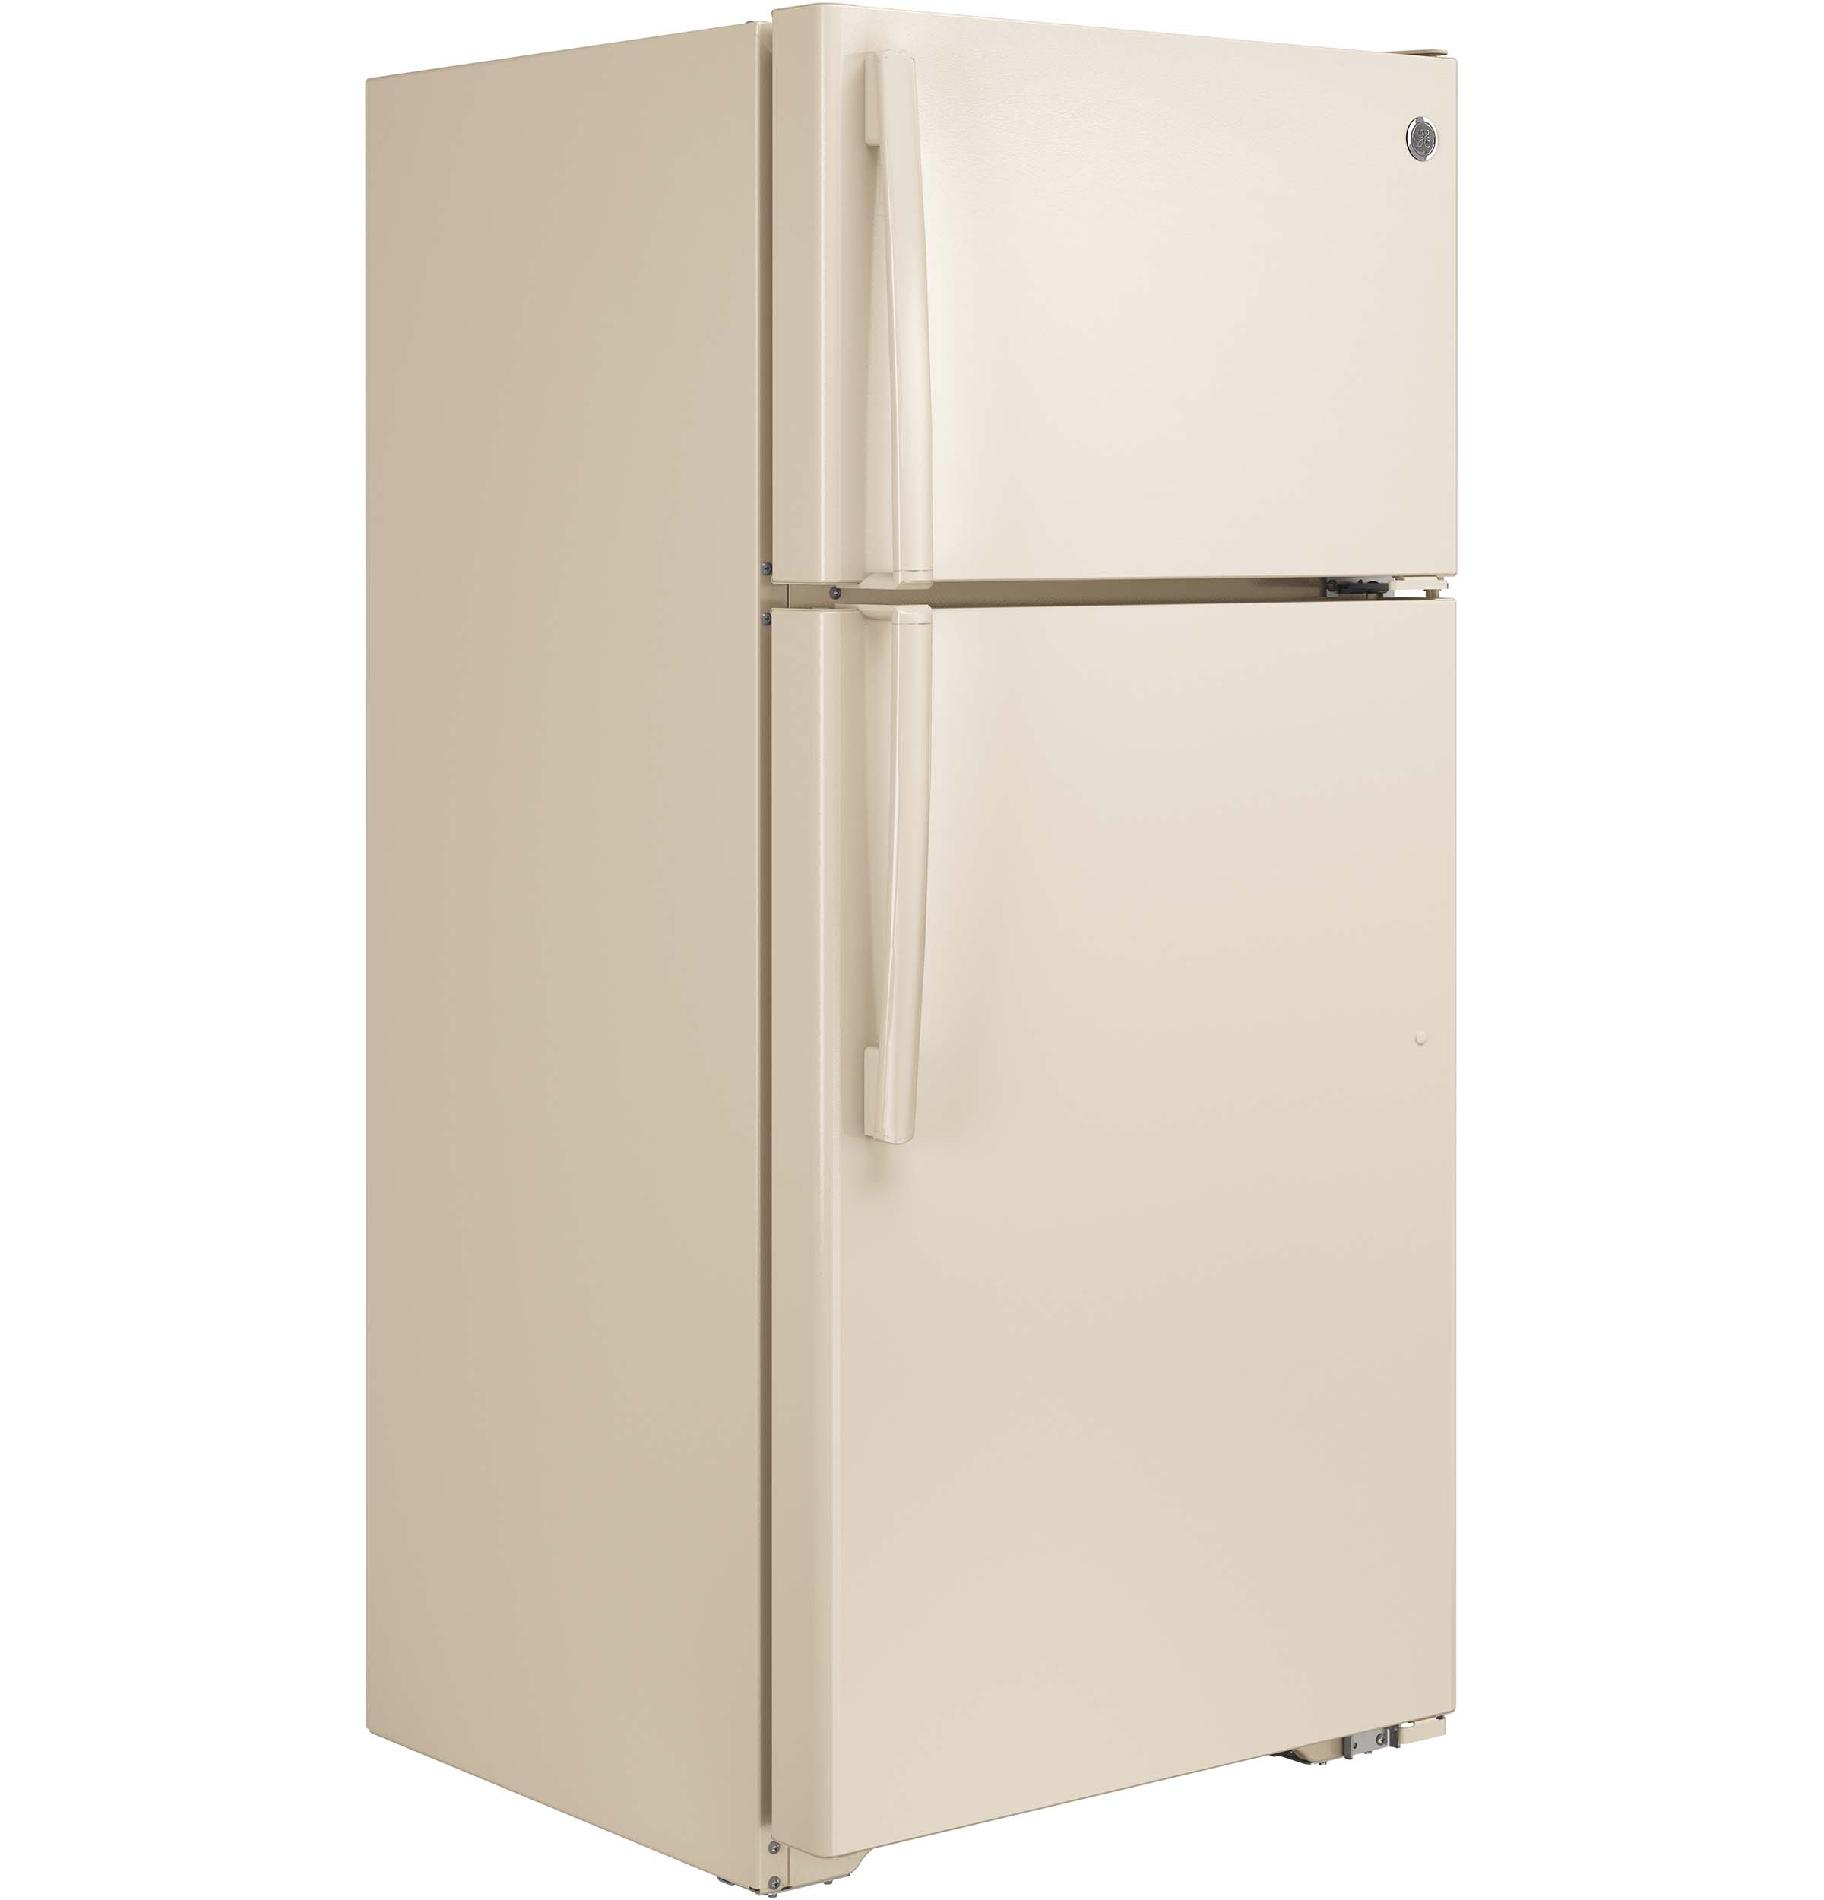 GE Appliances GTE15CTHRCC 14.6 cu. ft. Top-freezer Refrigerator - Bisque